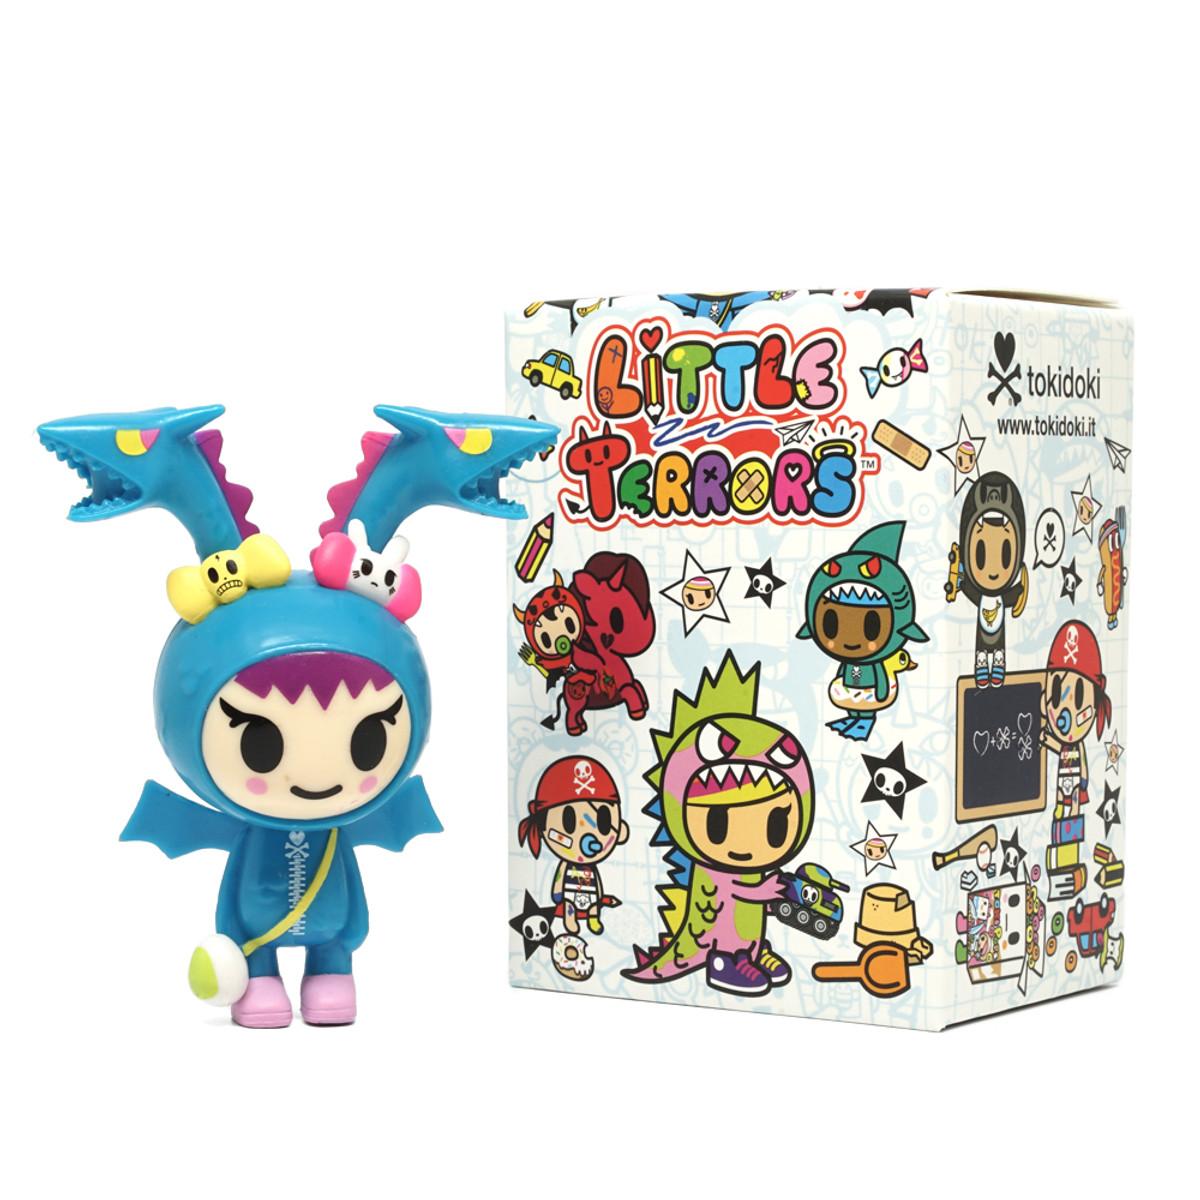 Tokidoki Little Terrors Blind Box NEW